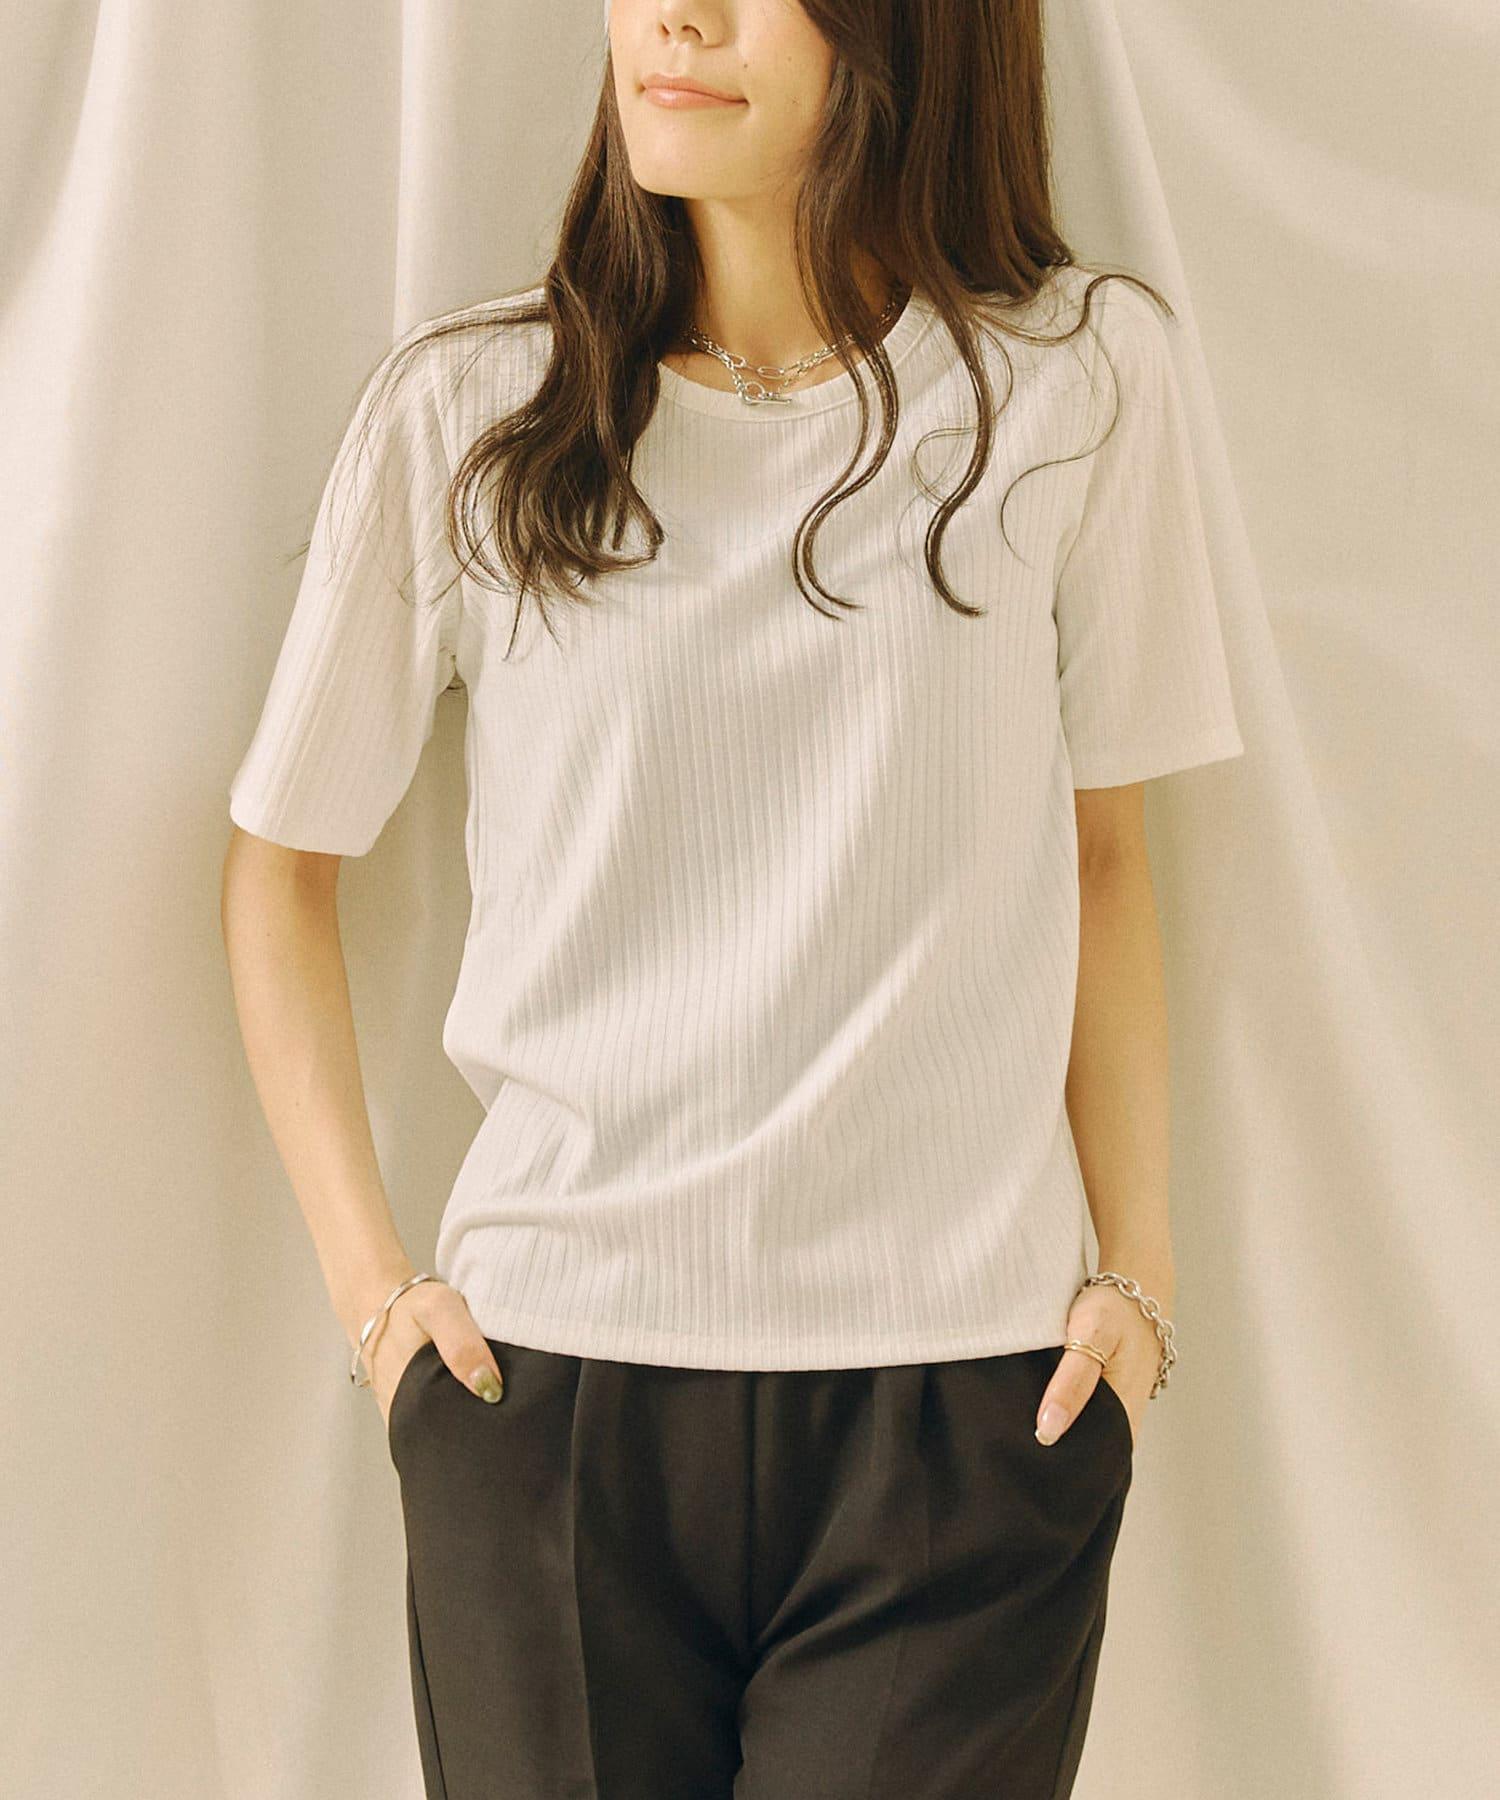 Chez toi(シェトワ) 抗菌防臭テレココンパクトTシャツ